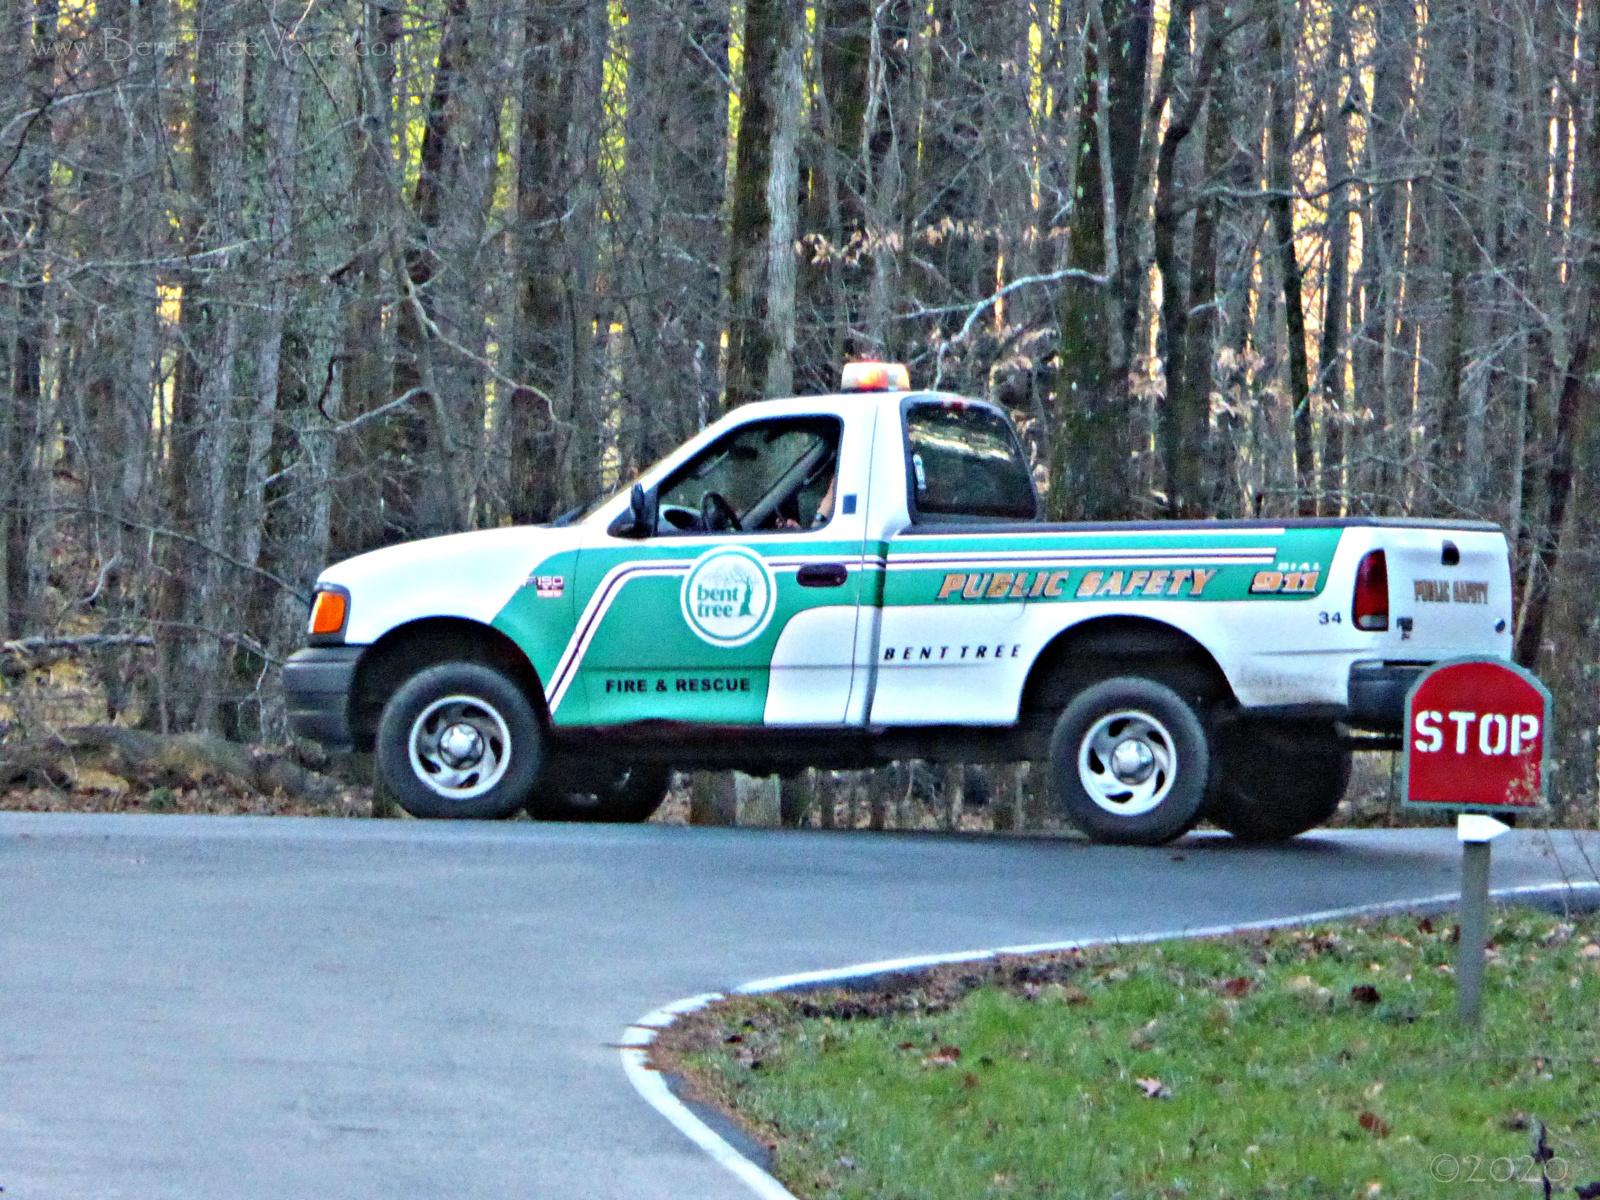 December 14, 2015 - Bent Tree Public Safety truck